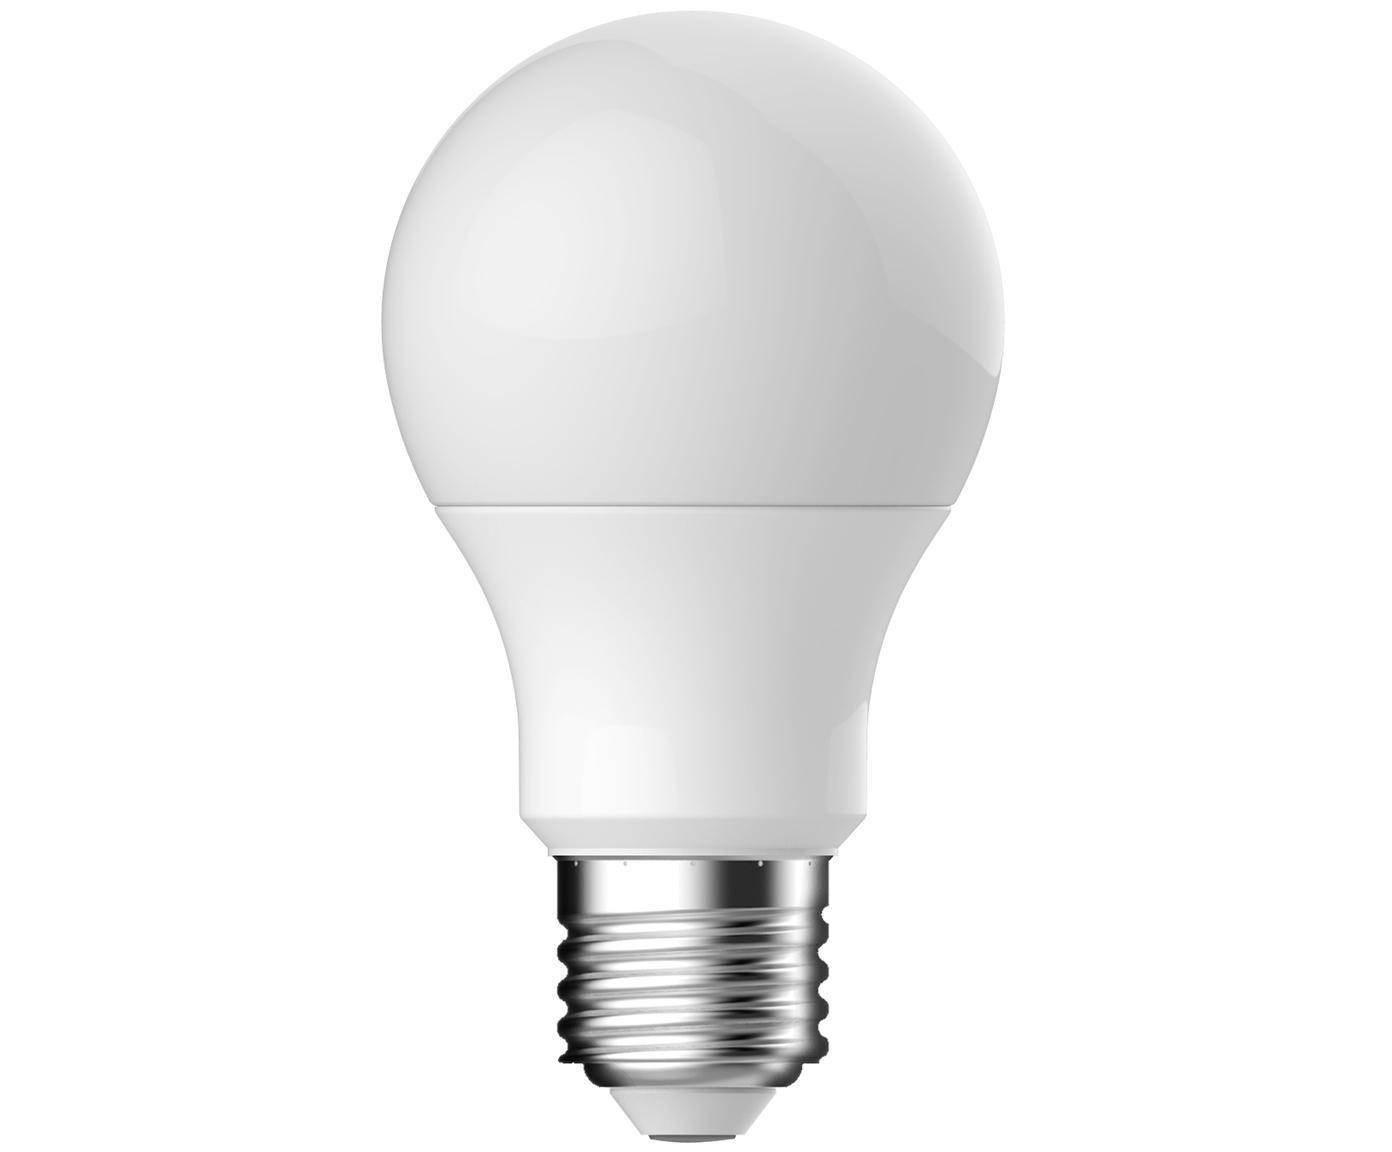 Dimbare LED lamp Frost (E27 / 11W ), Peertje: opaalglas, Fitting: aluminium, Wit, Ø 6 x H 11 cm